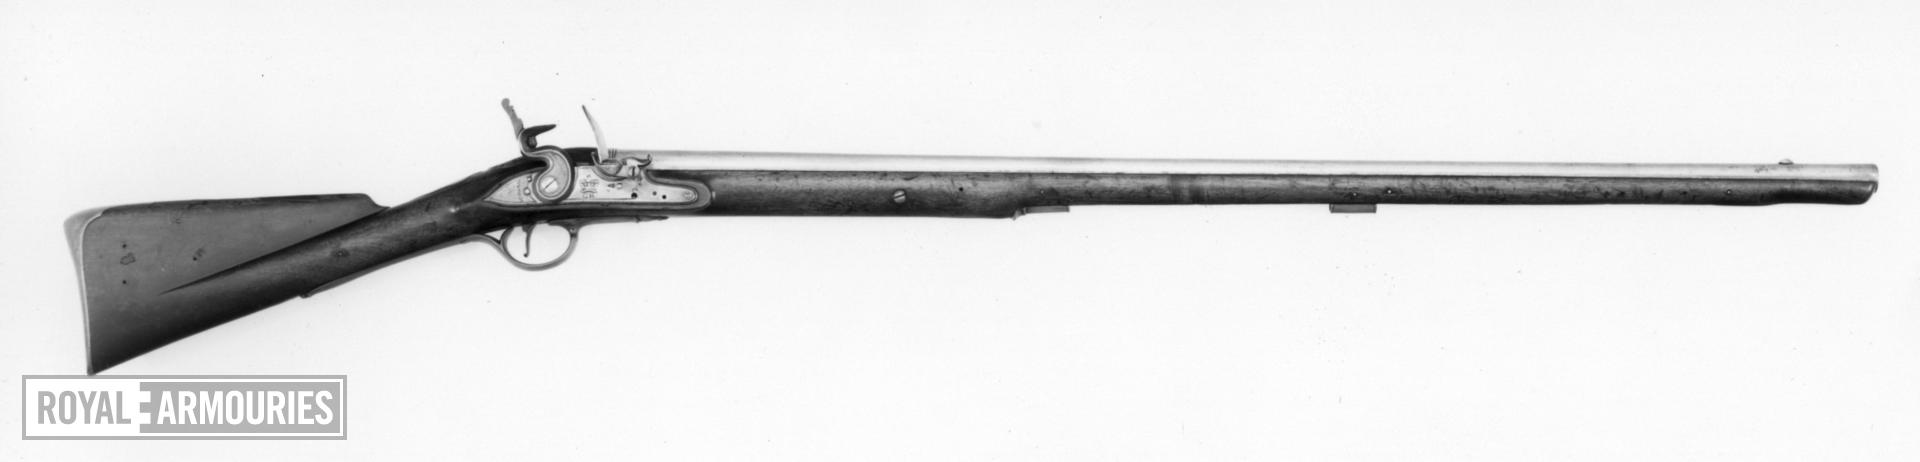 Flintlock muzzle-loading military carbine - Pattern 1756/77 Royal Horse Guards (Blues)